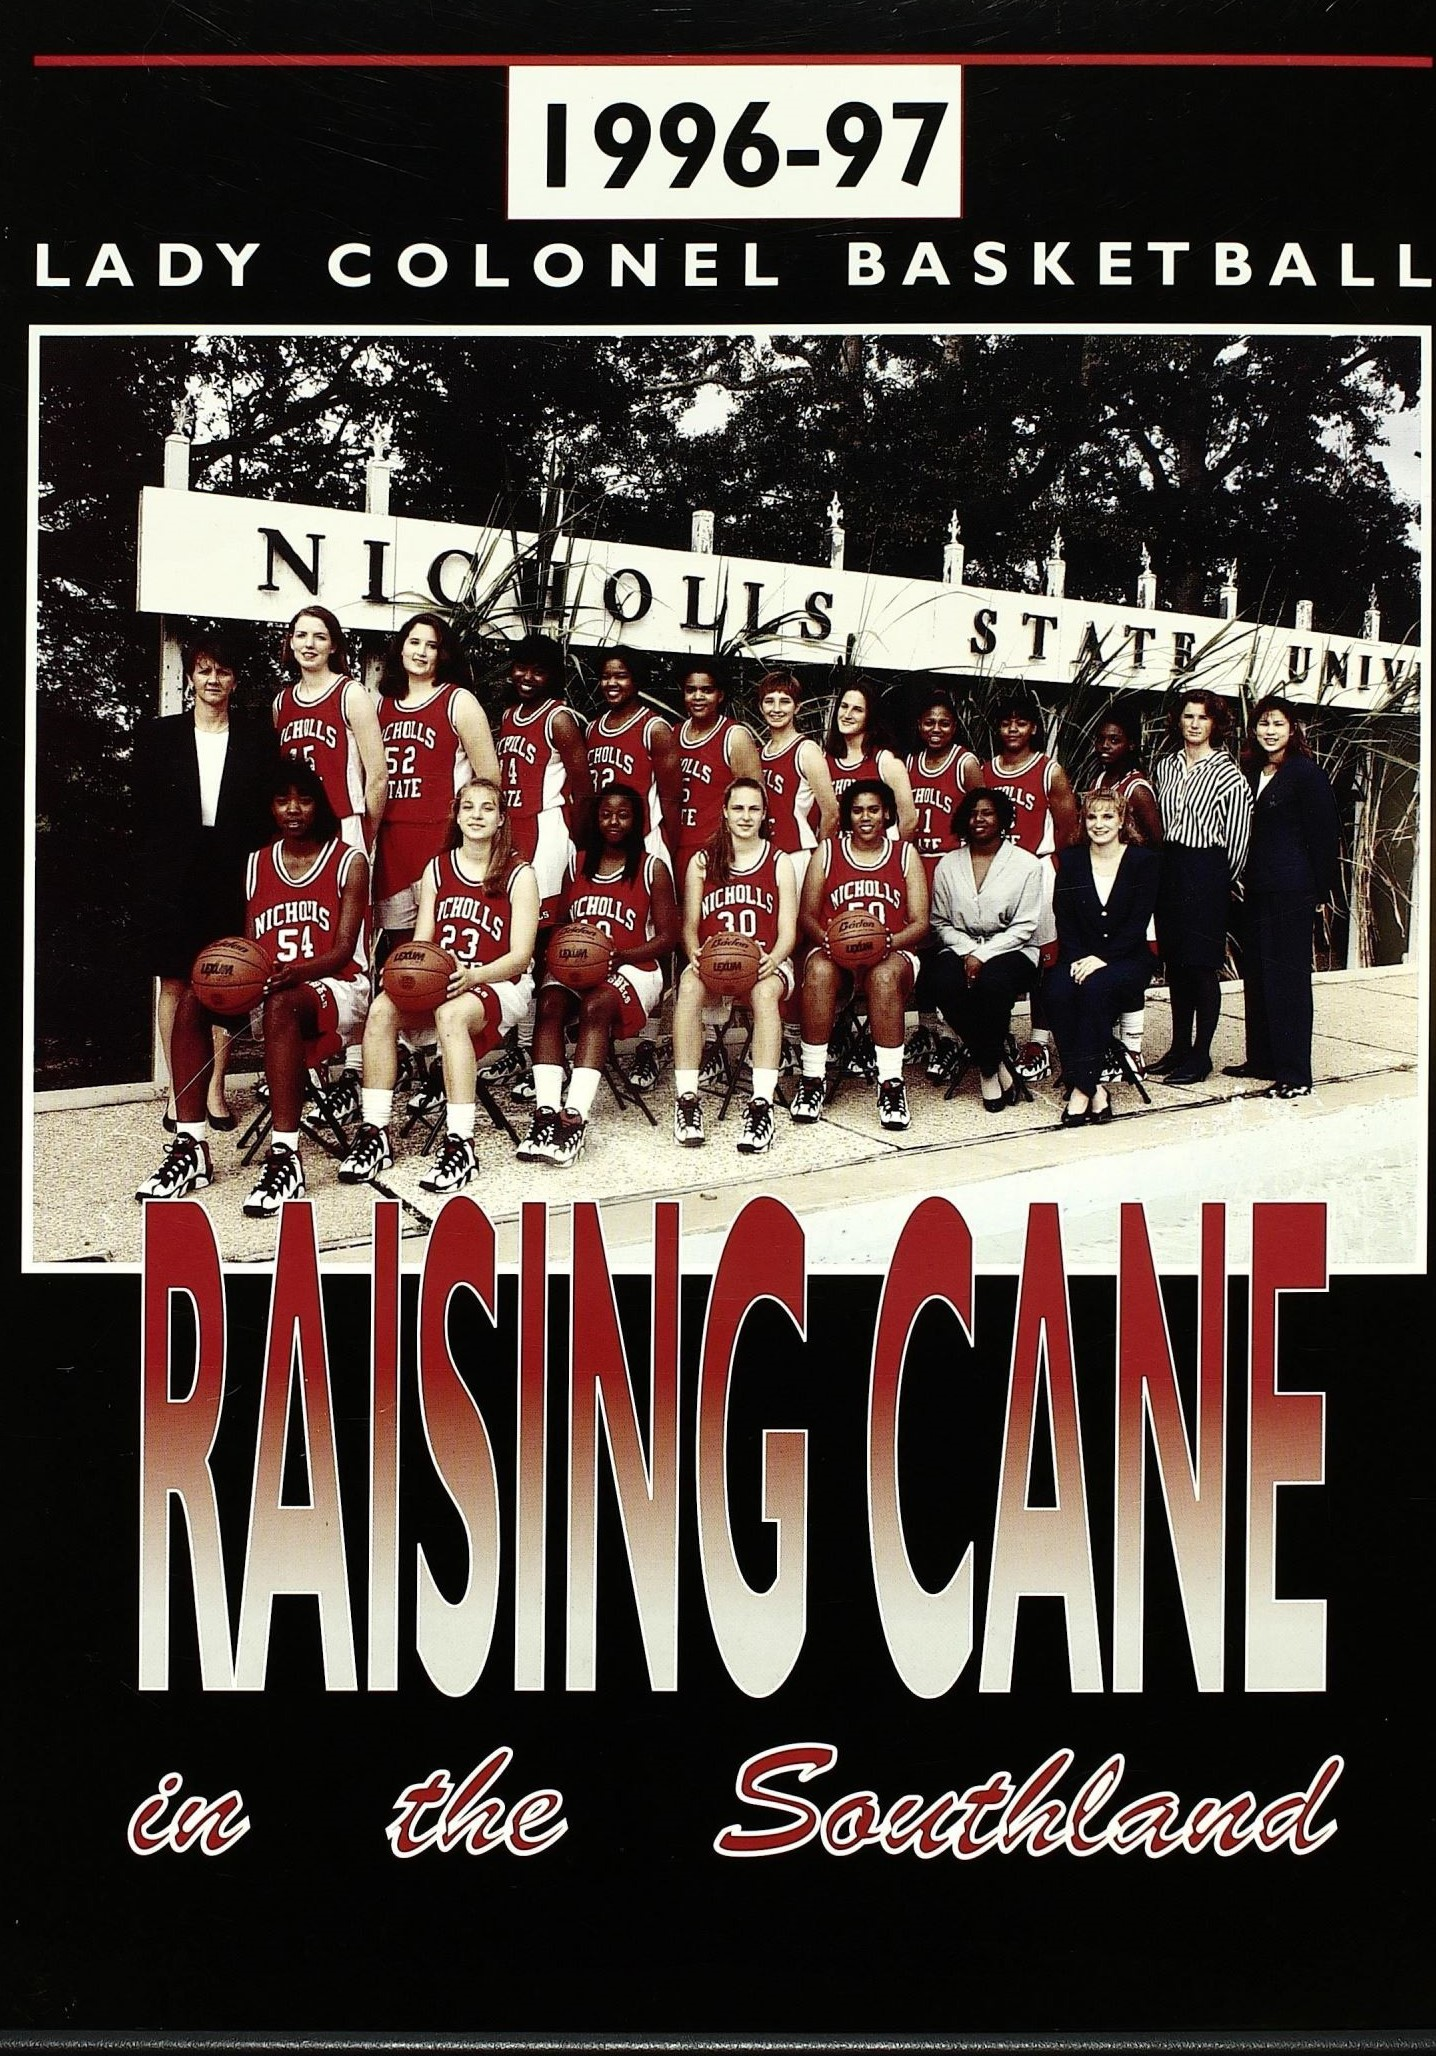 1996-1997 Program Cover